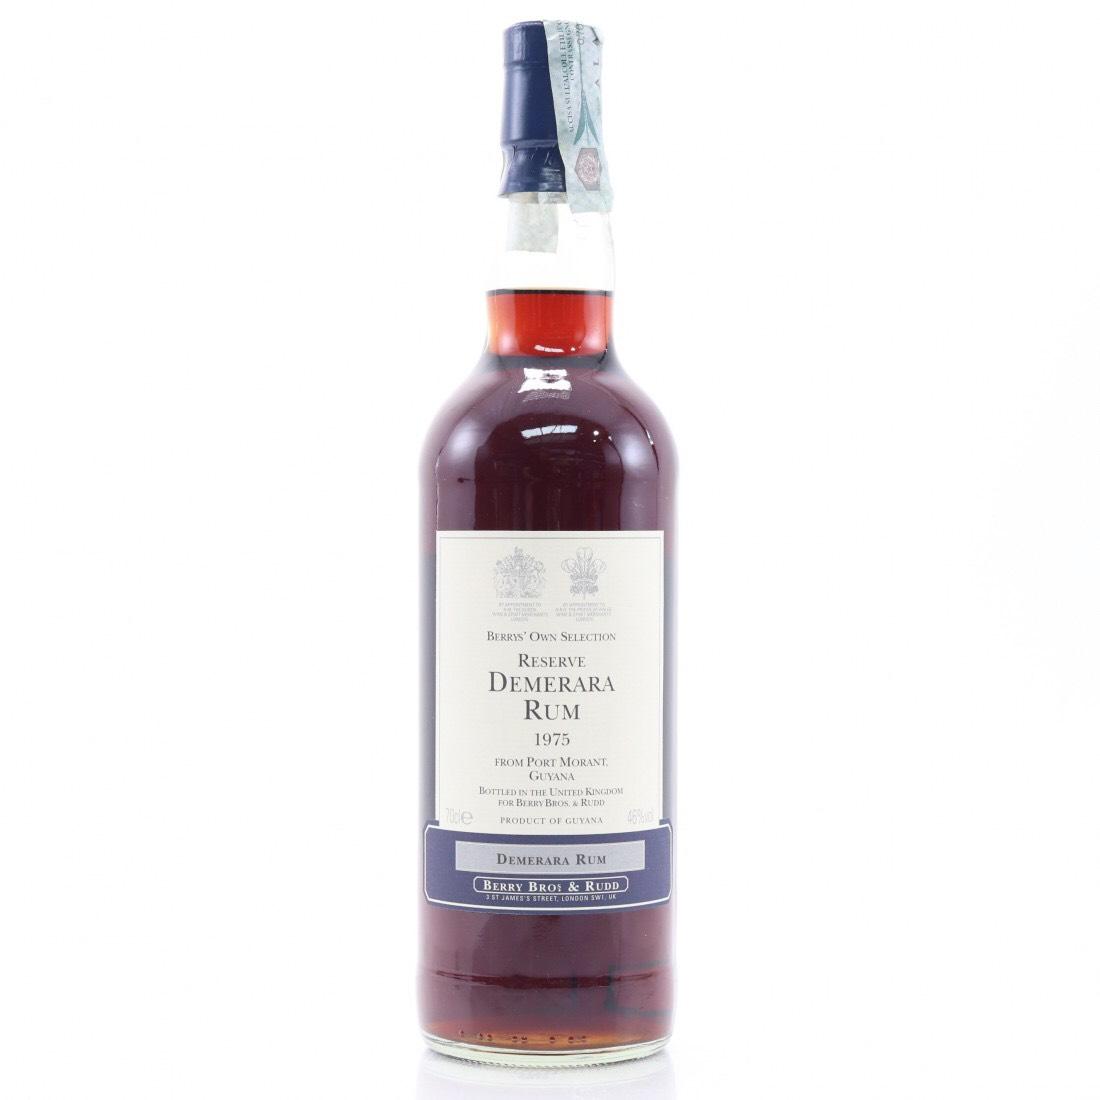 Bottle image of Reserve Demerara Rum